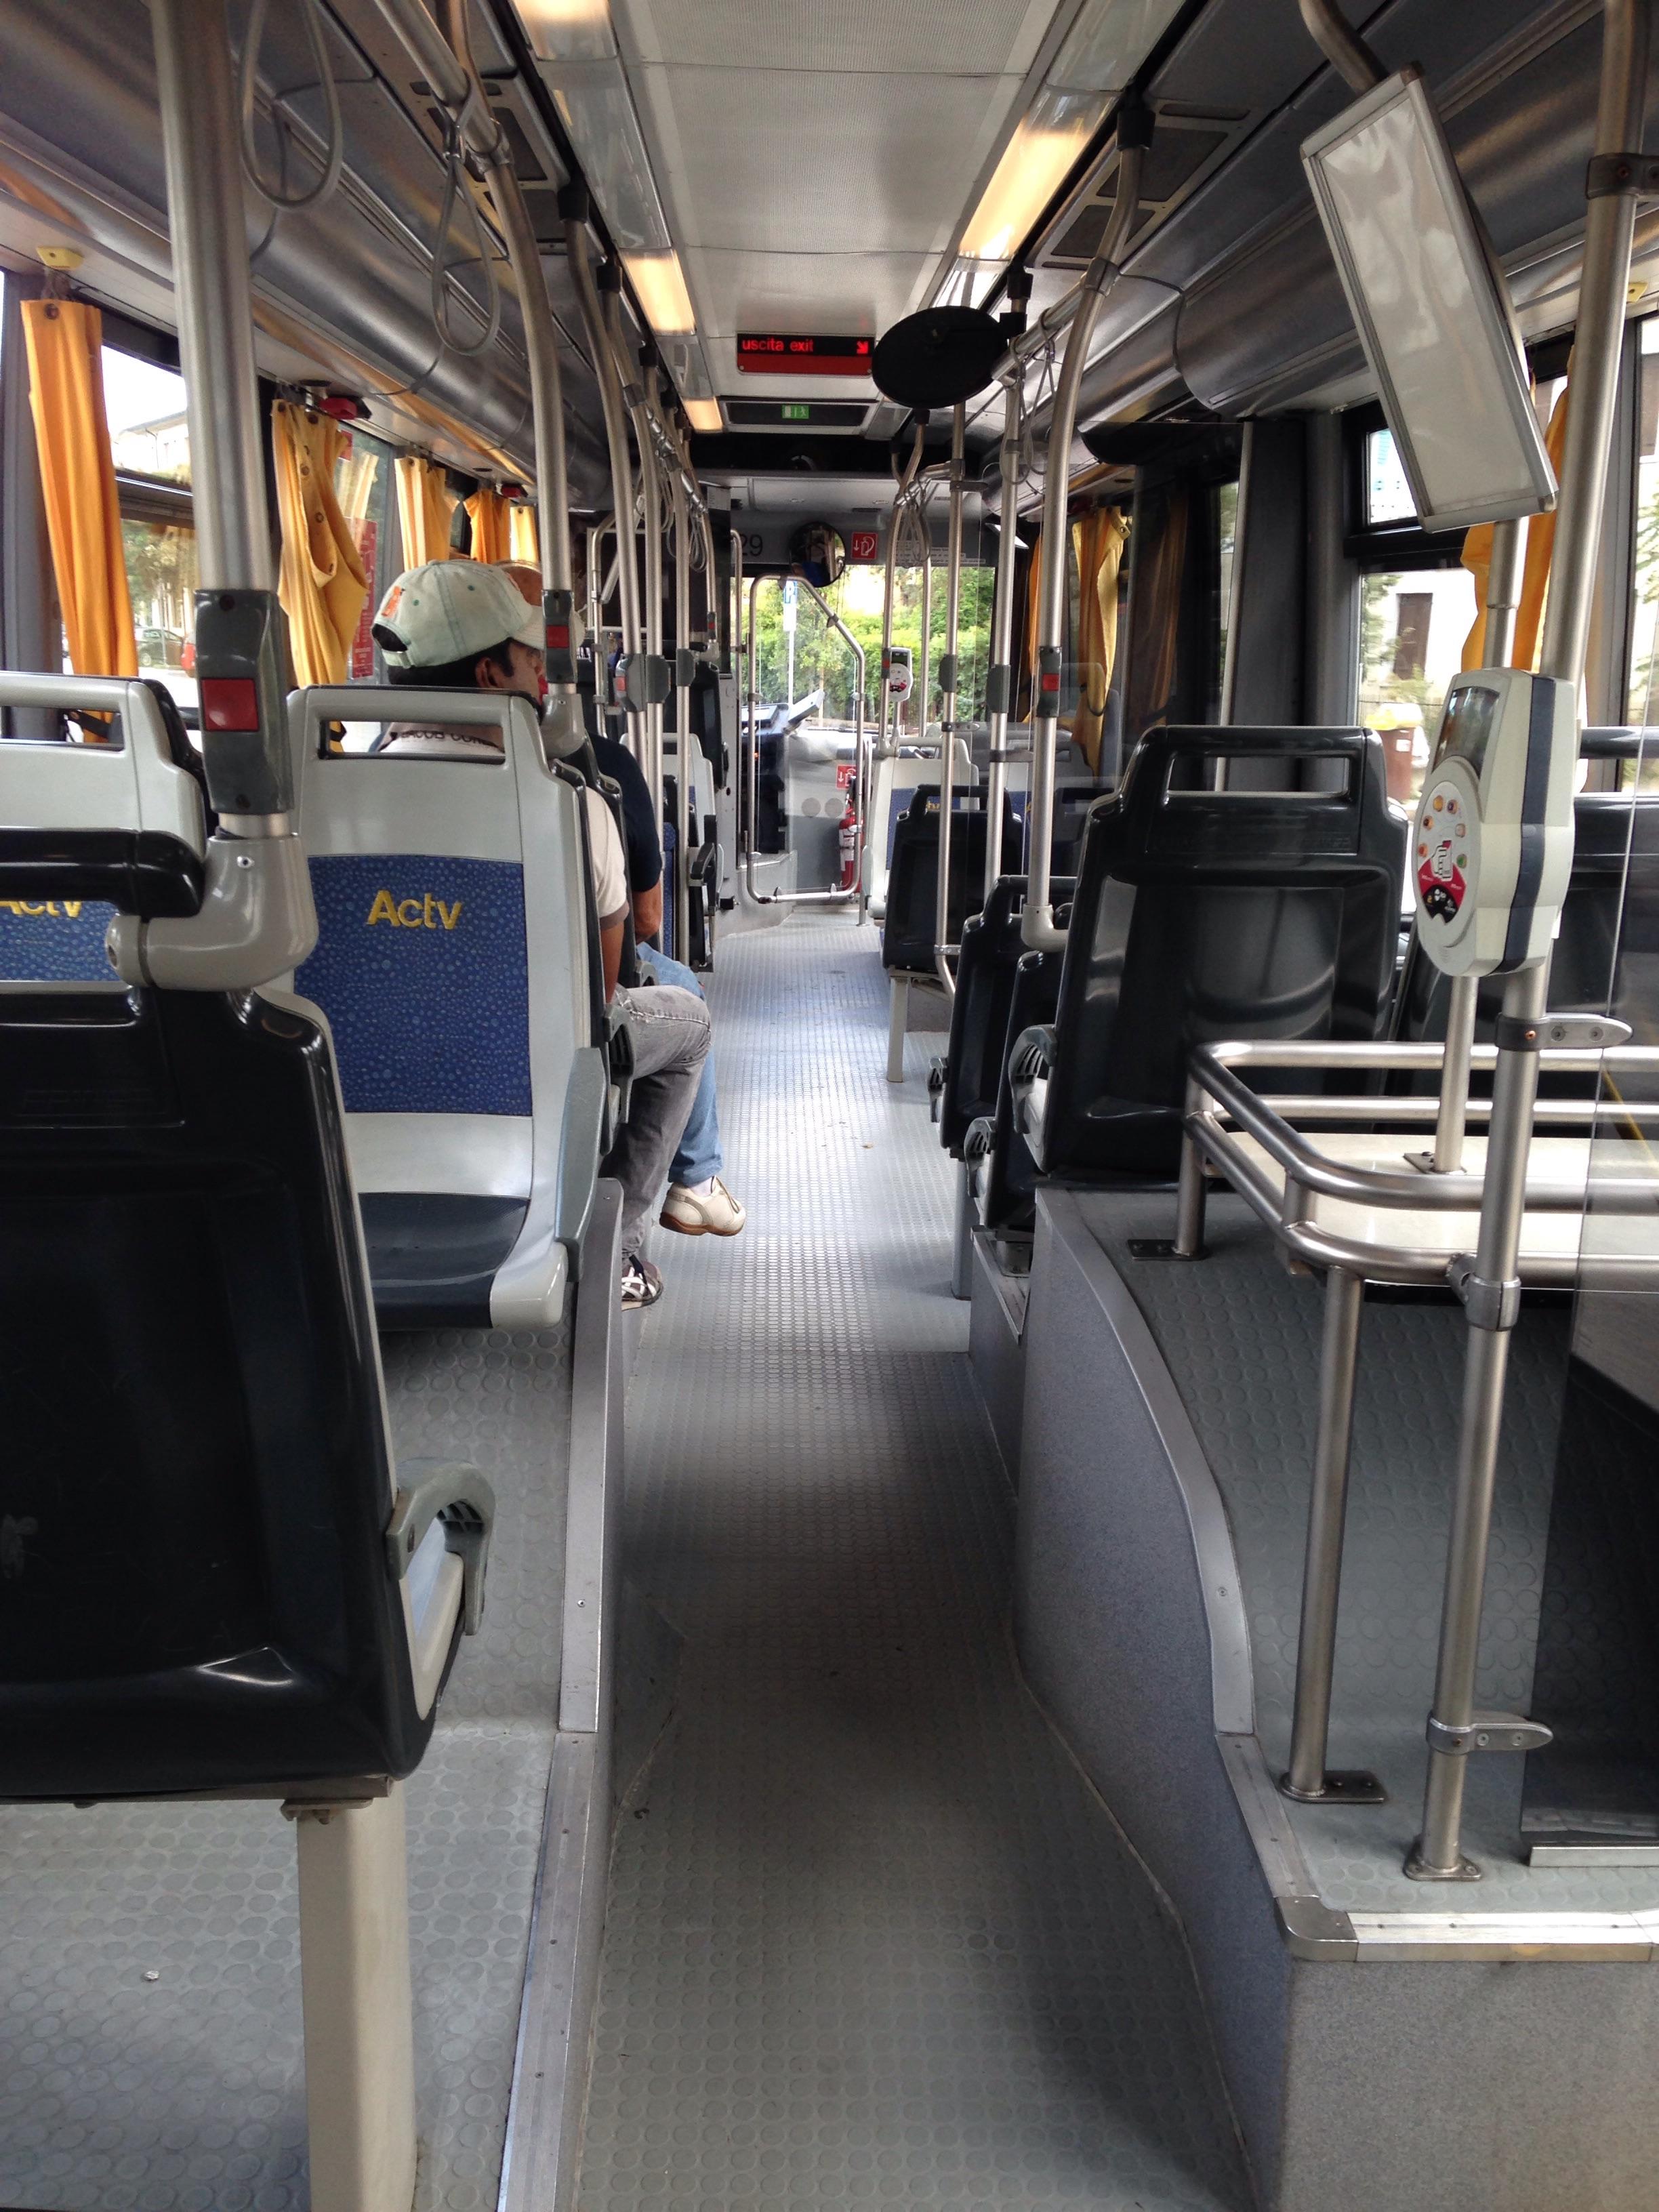 file interno autobus scania omnicity actv venezia